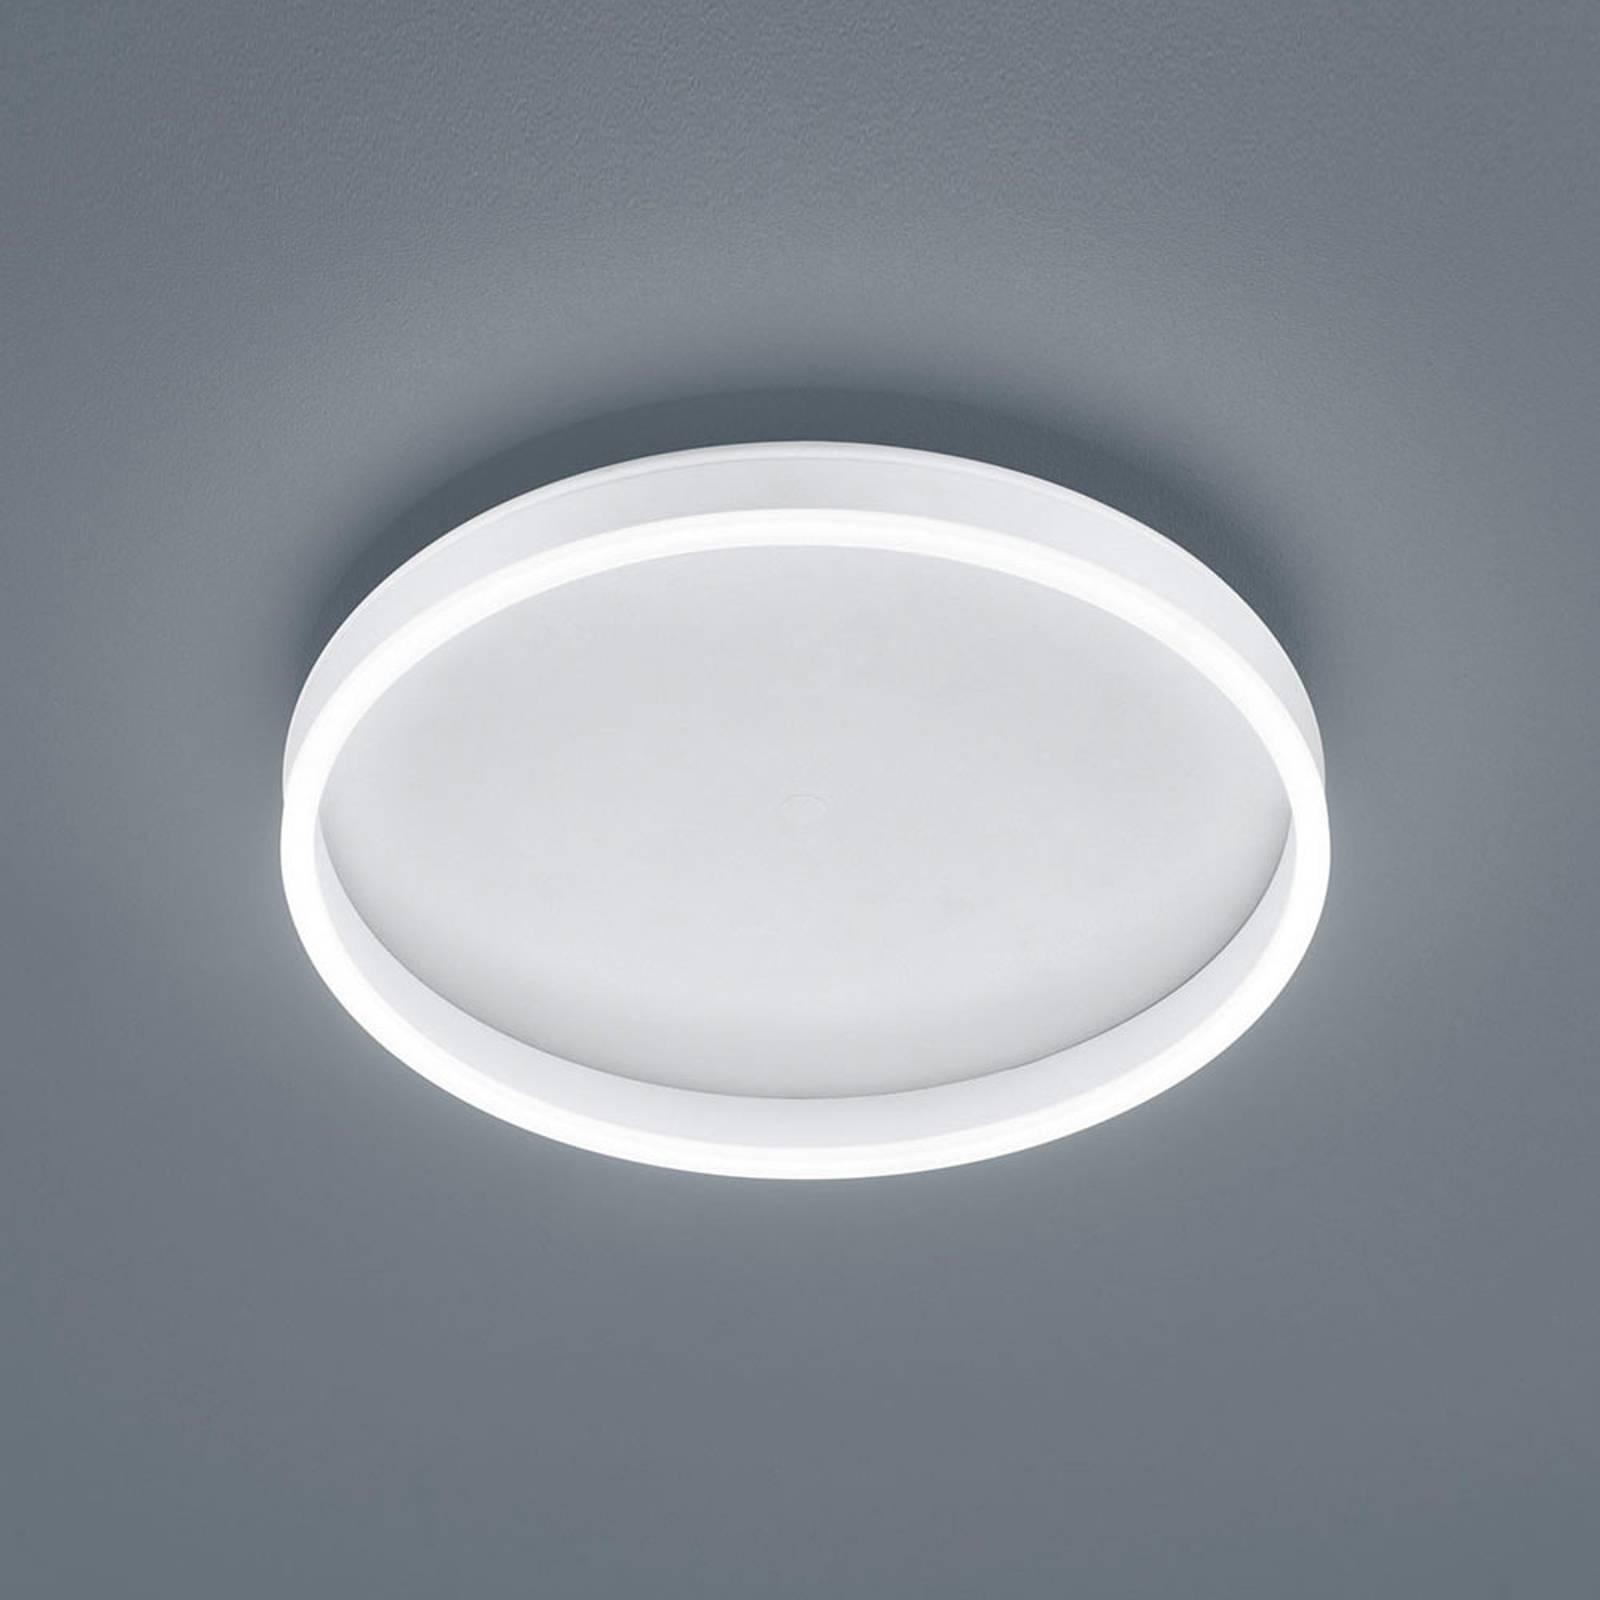 Helestra Sona LED plafondlamp dimbaar Ø40cm wit